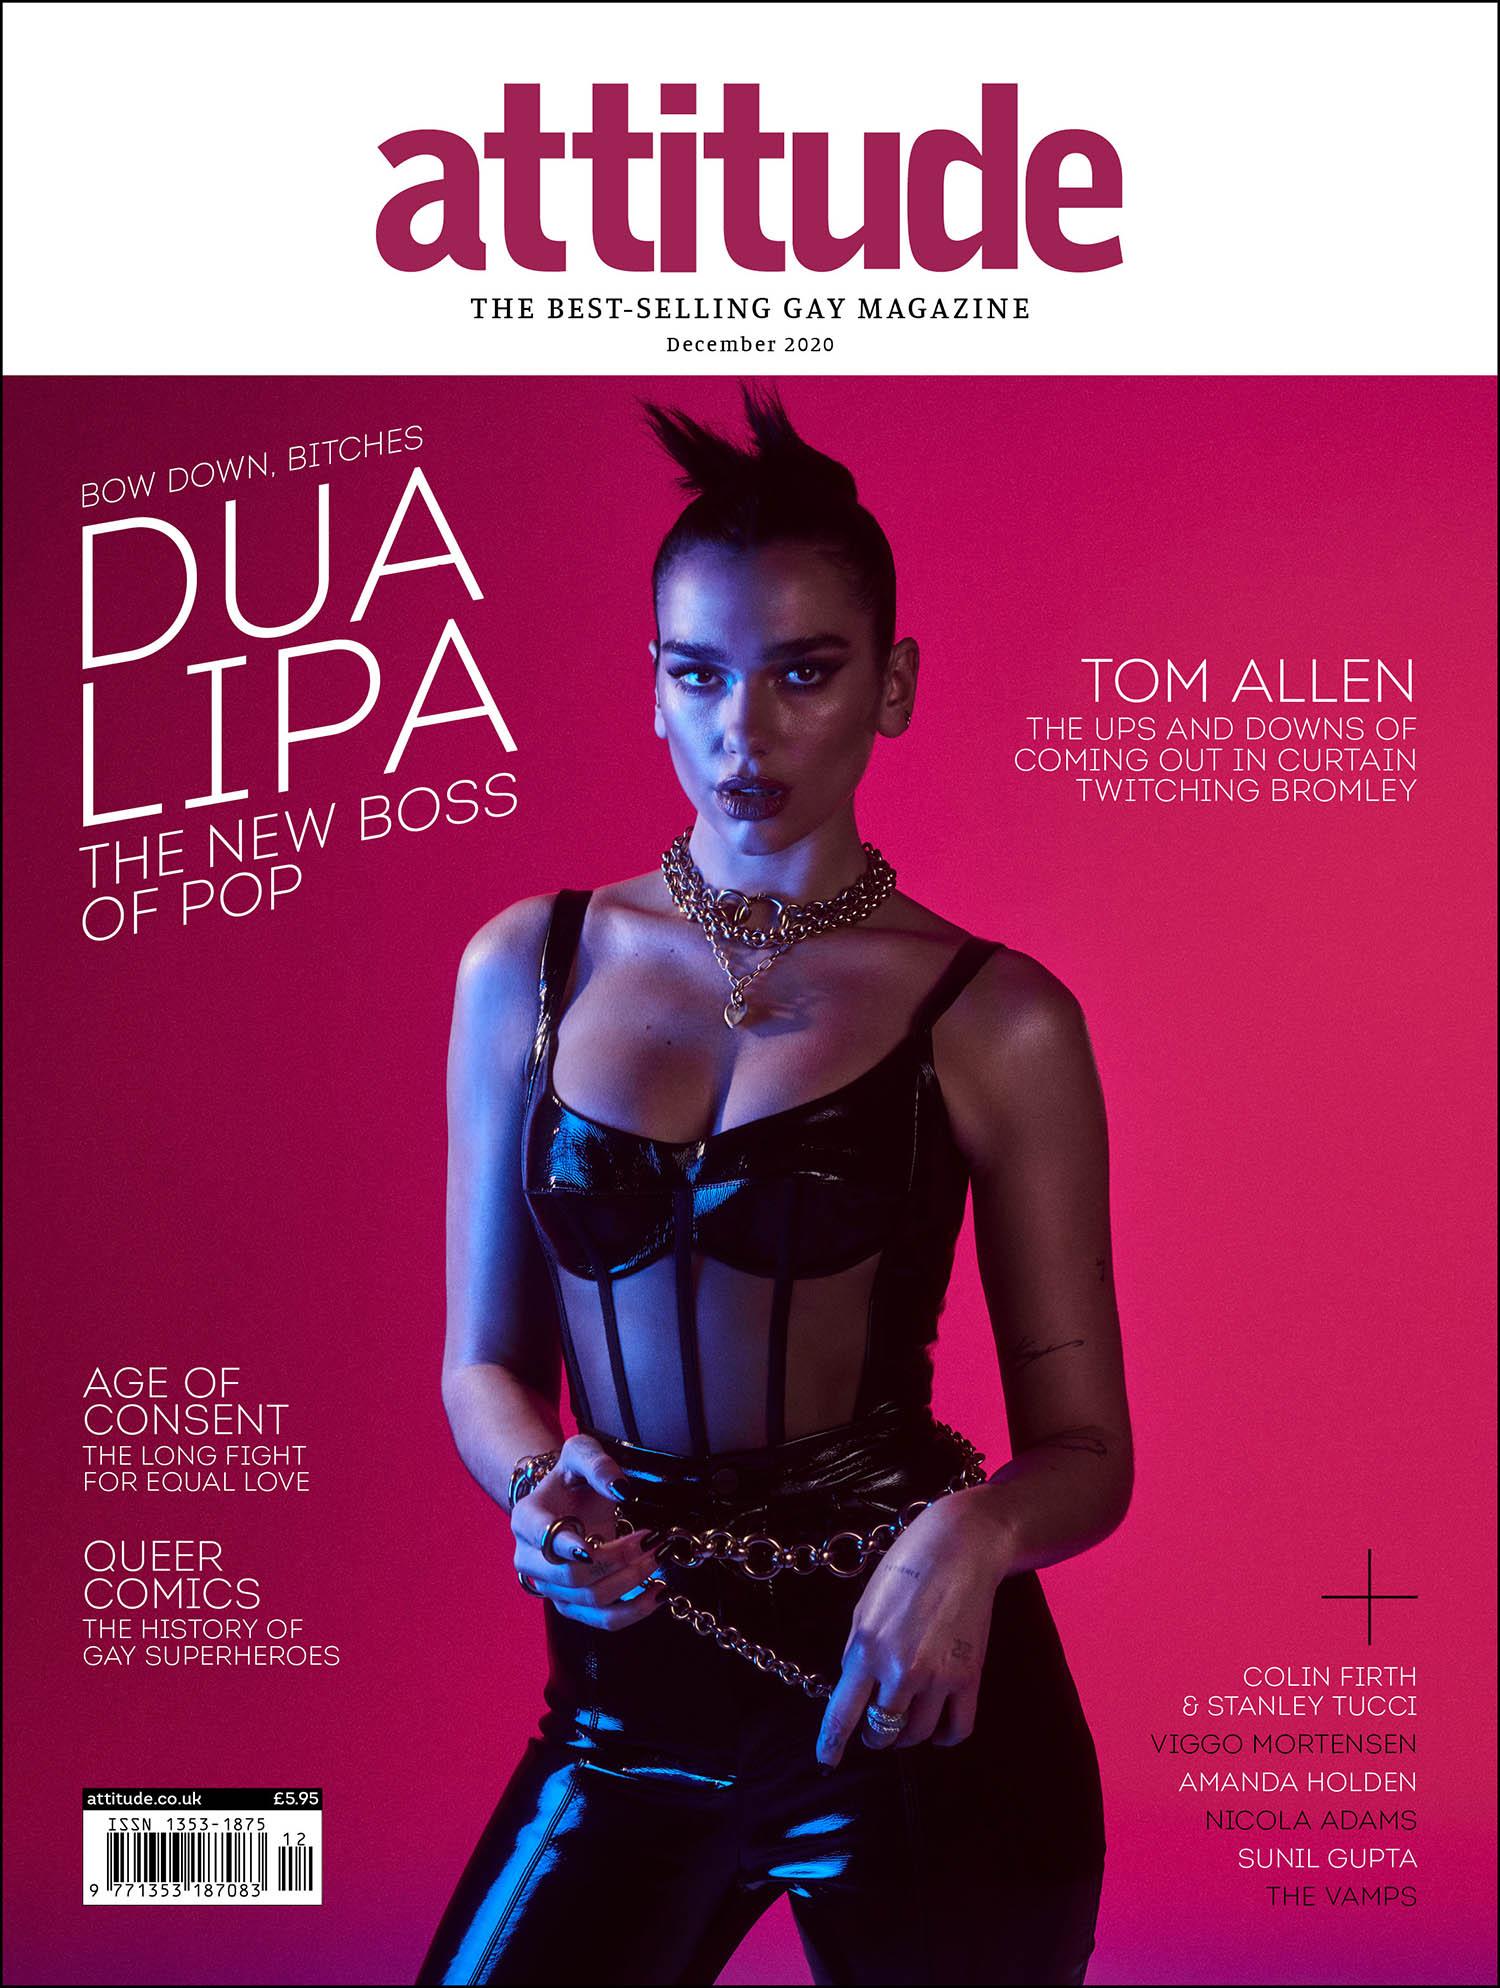 Dua Lipa covers Attitude Magazine December 2020 by Jonas Bresnan